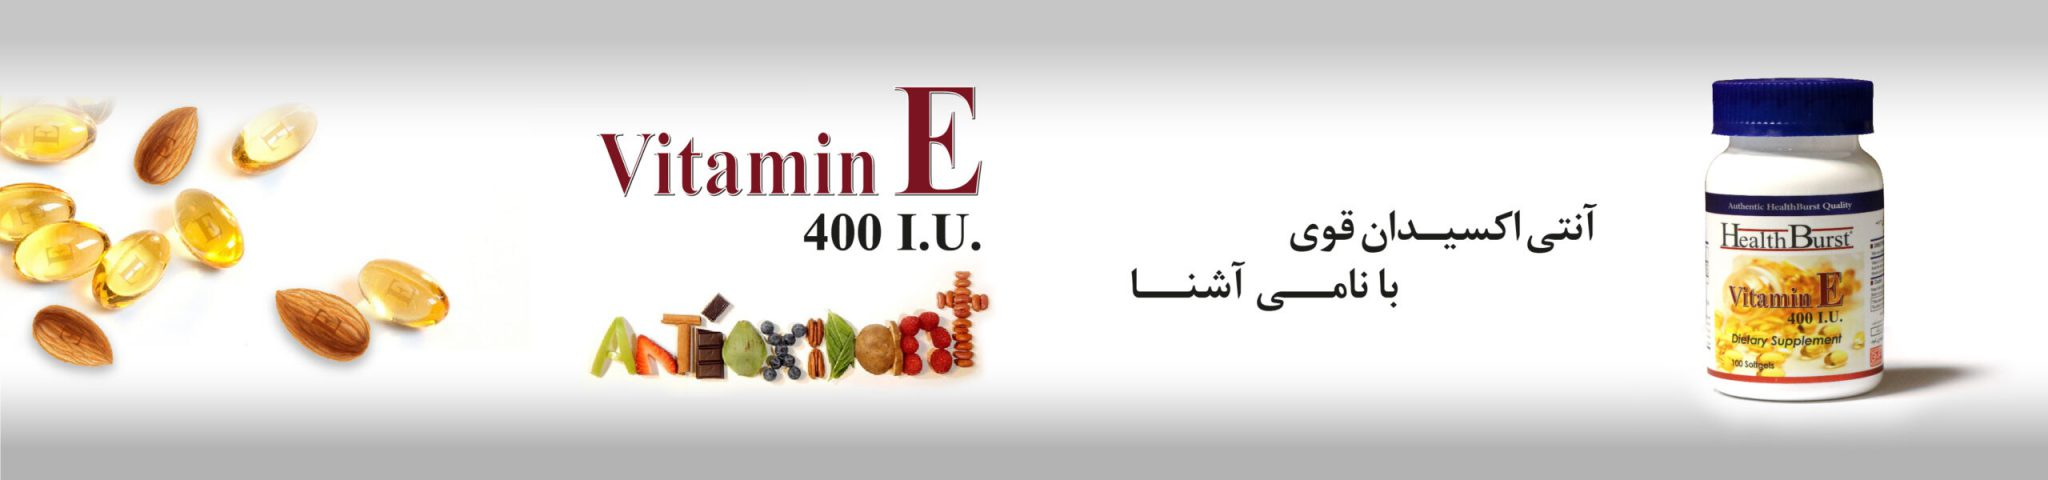 کپسول ژلاتینی ویتامین E 400 IU هلث برست Health Burst Vitamin E 400 IU